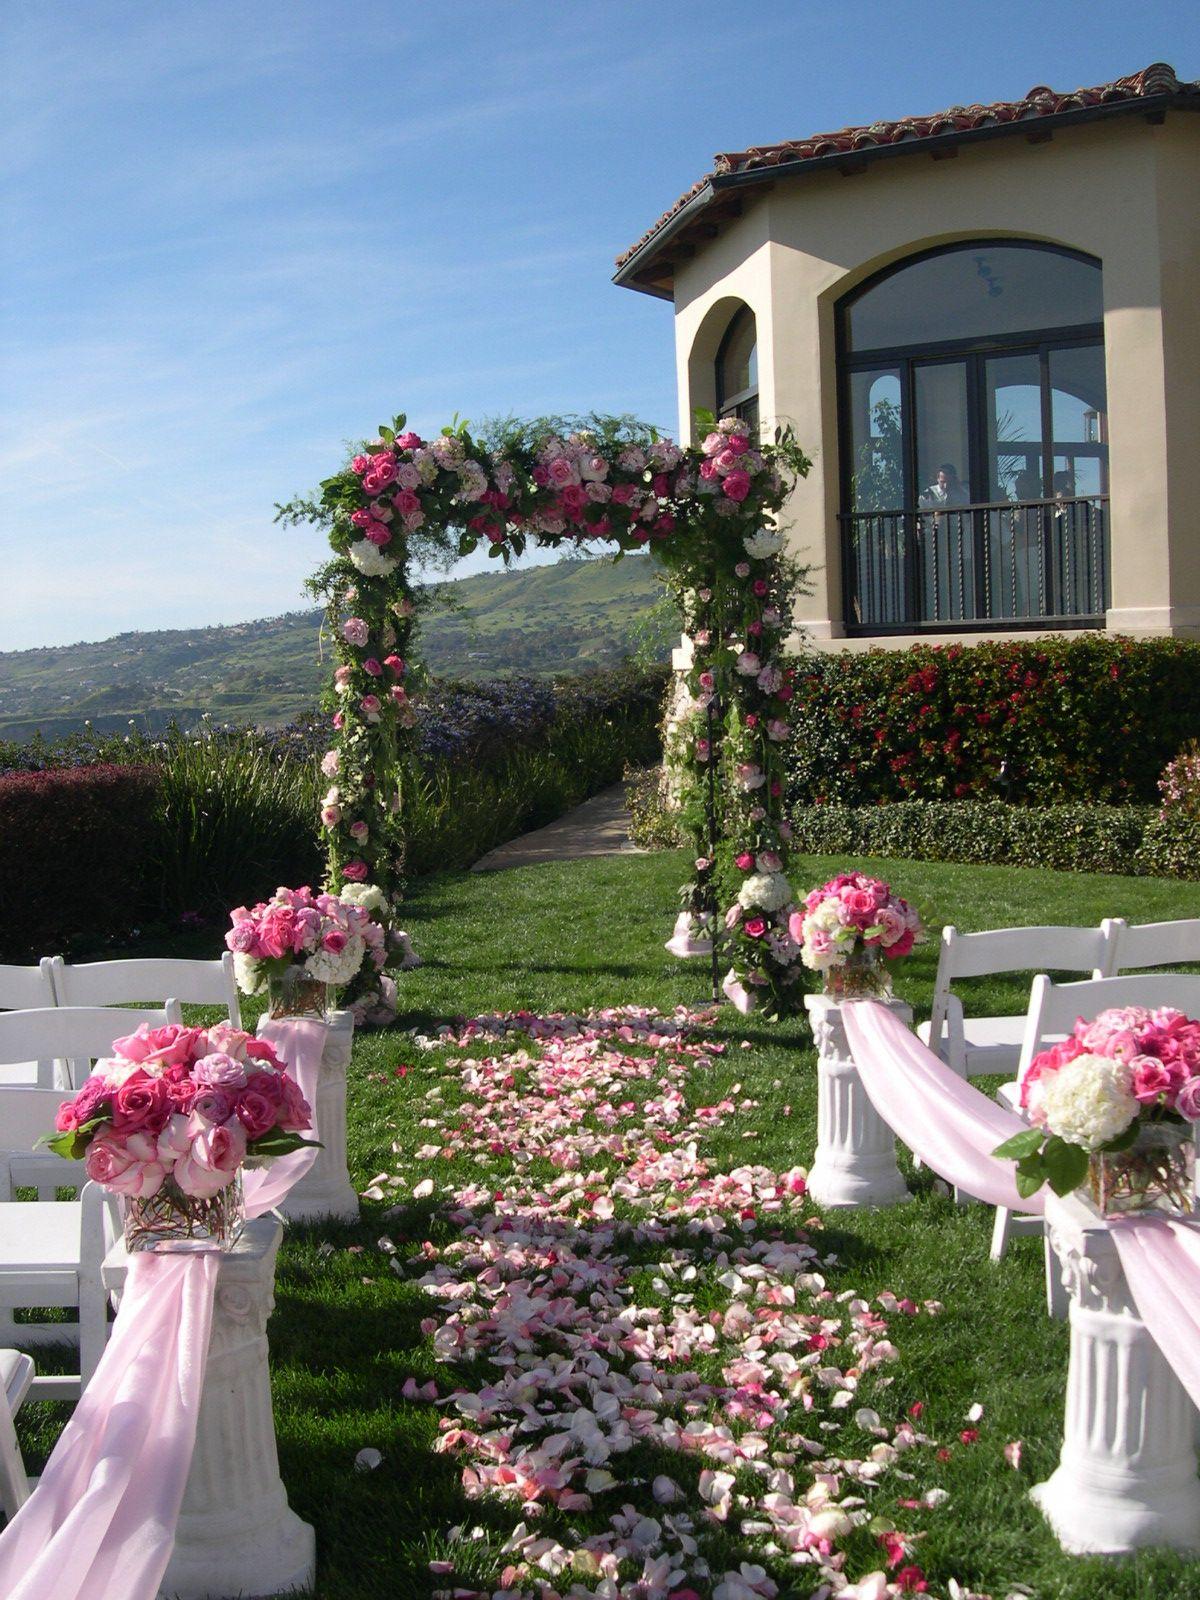 The Wedding Decor